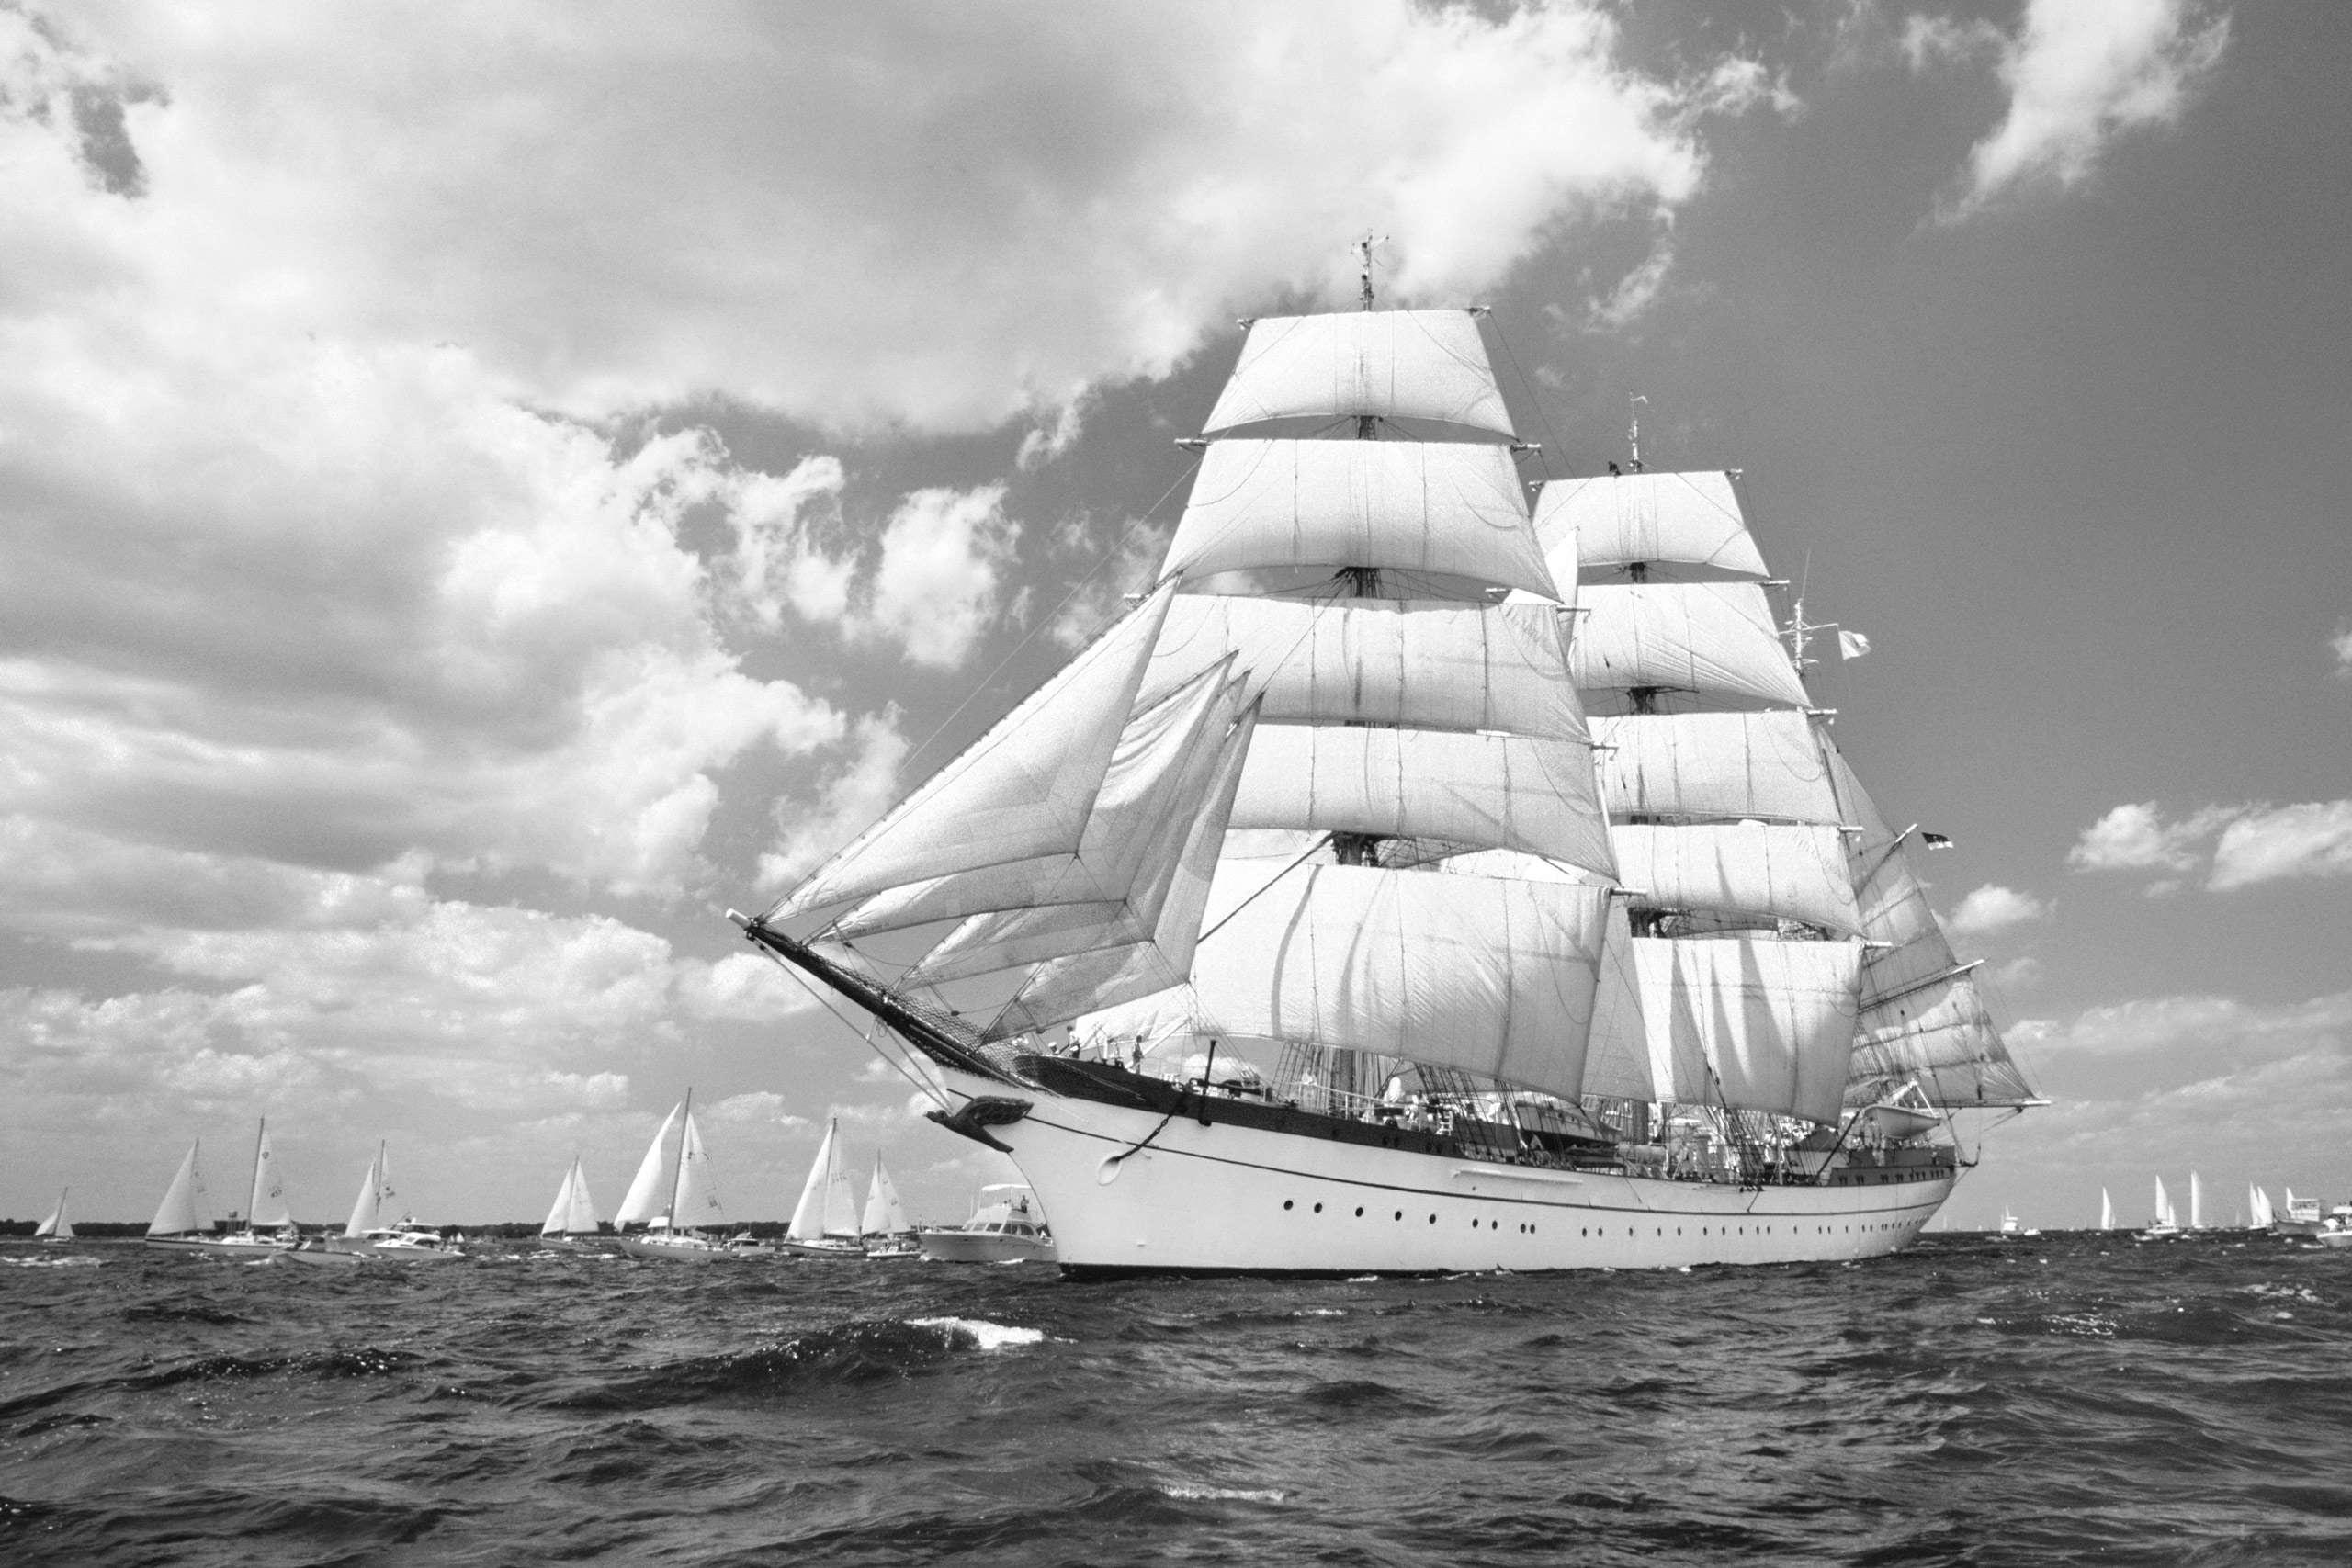 PORTFOLIO - Sailing - Tall Ships #22-PCG173